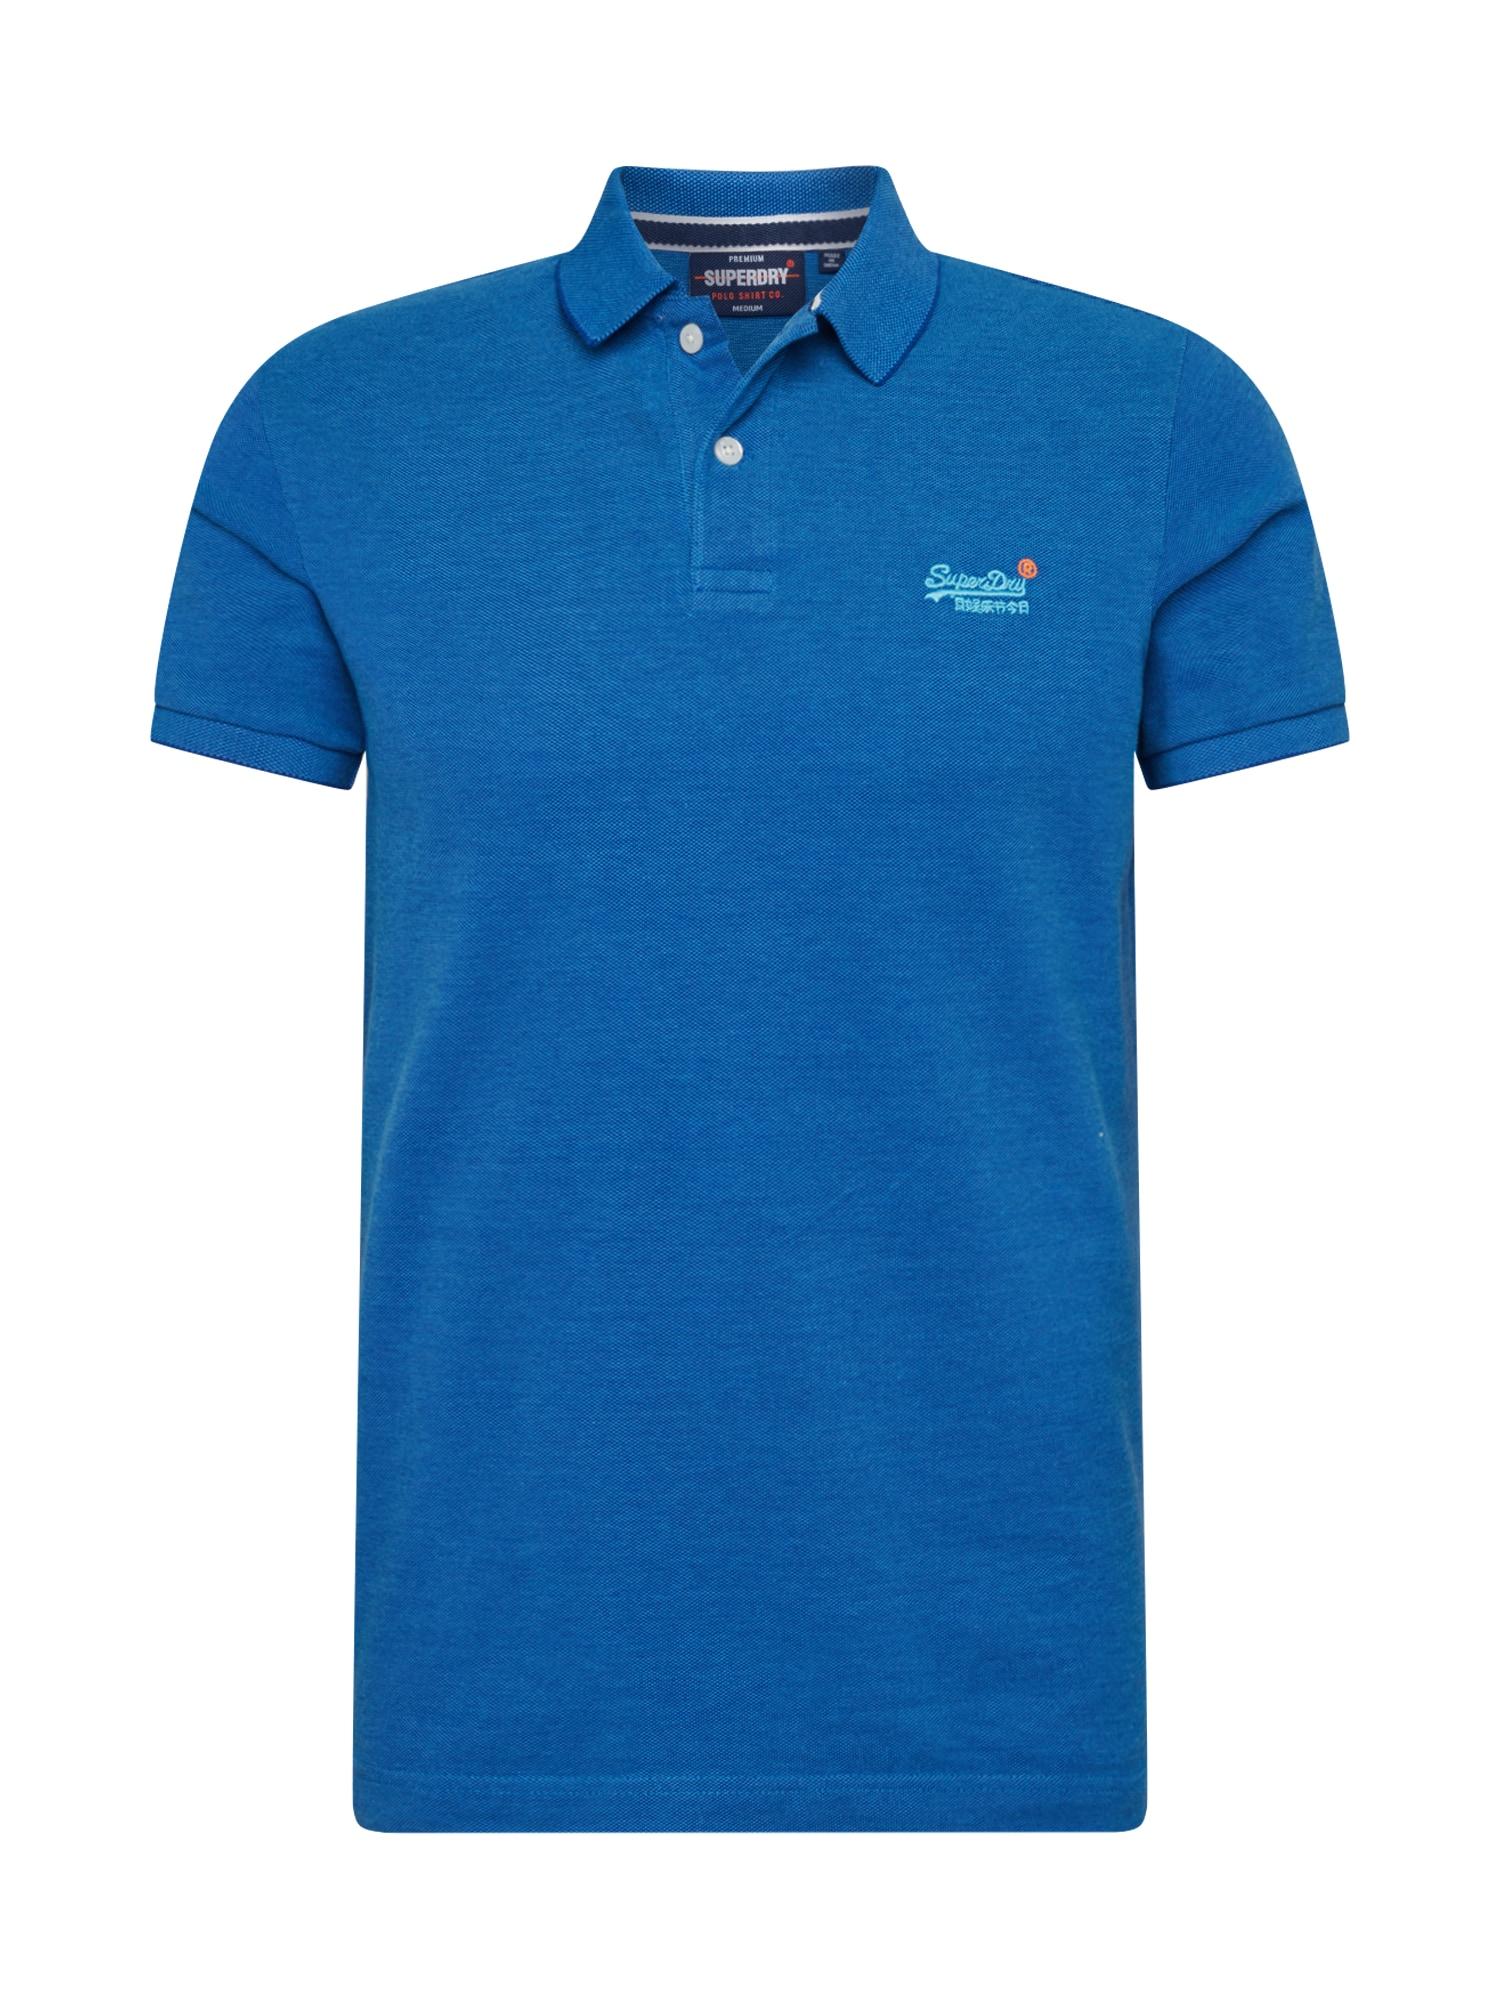 Superdry Marškinėliai margai mėlyna